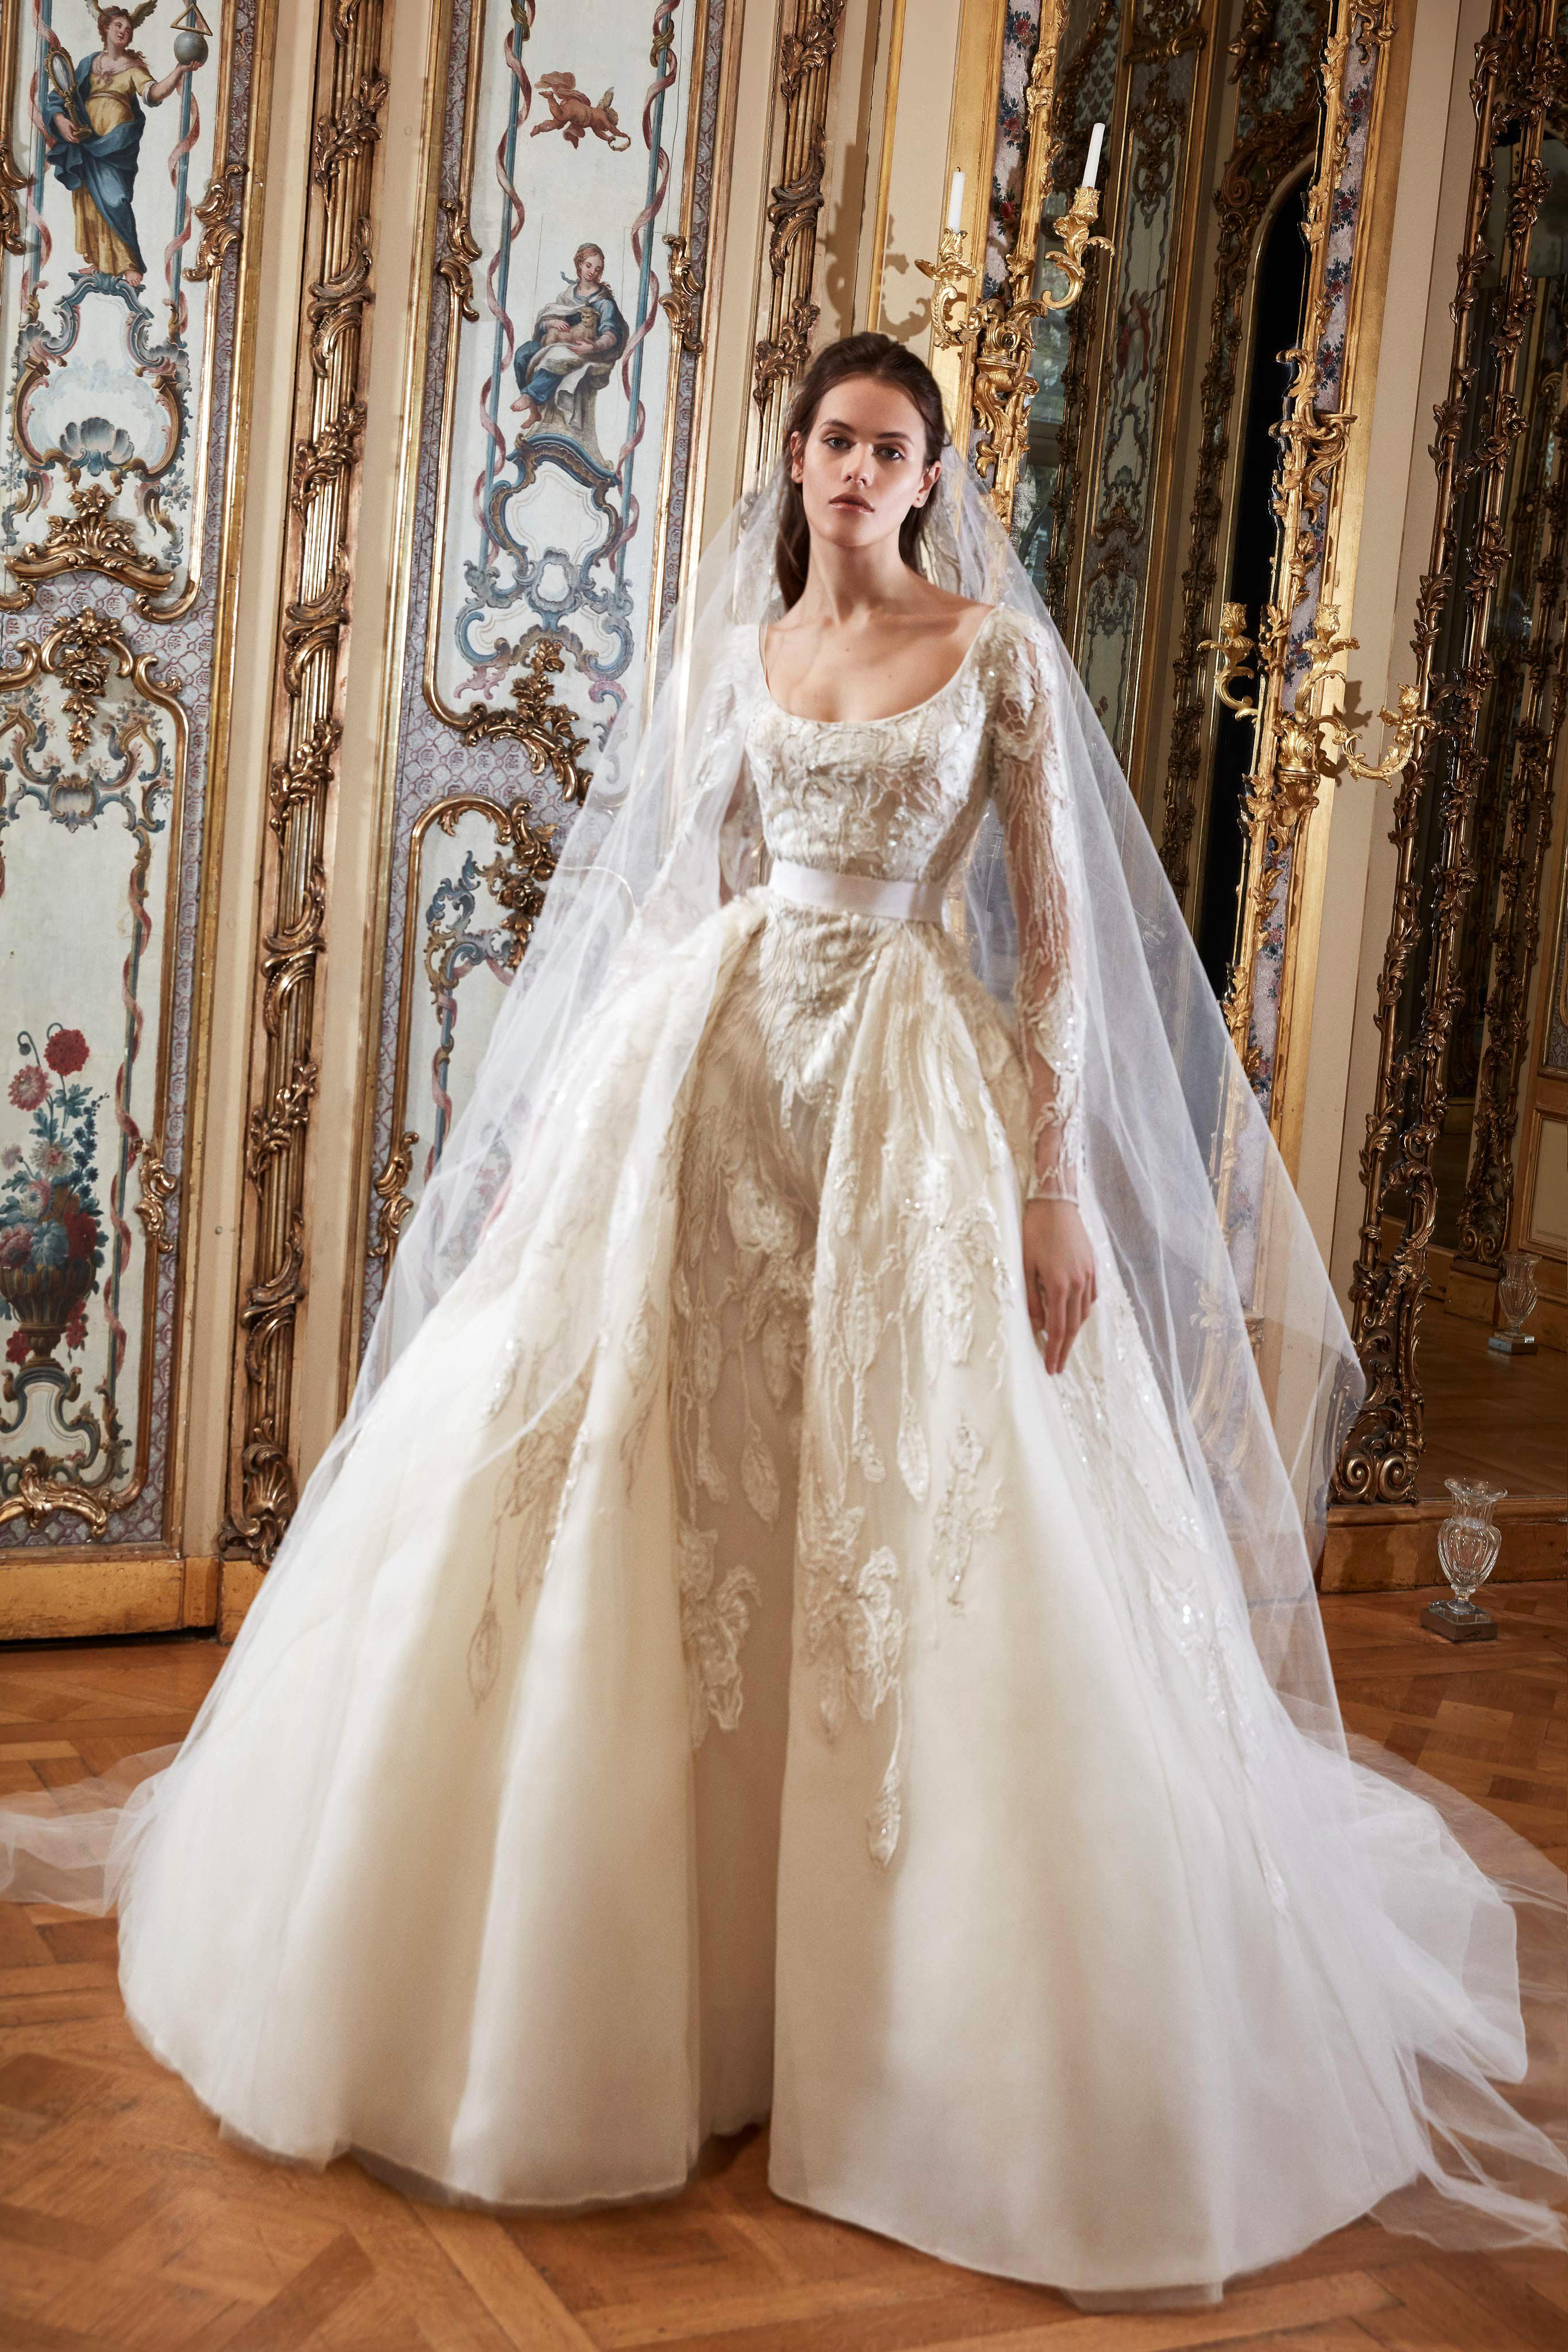 elie saab wedding dress spring 2019 long sleeves embellished ballgown